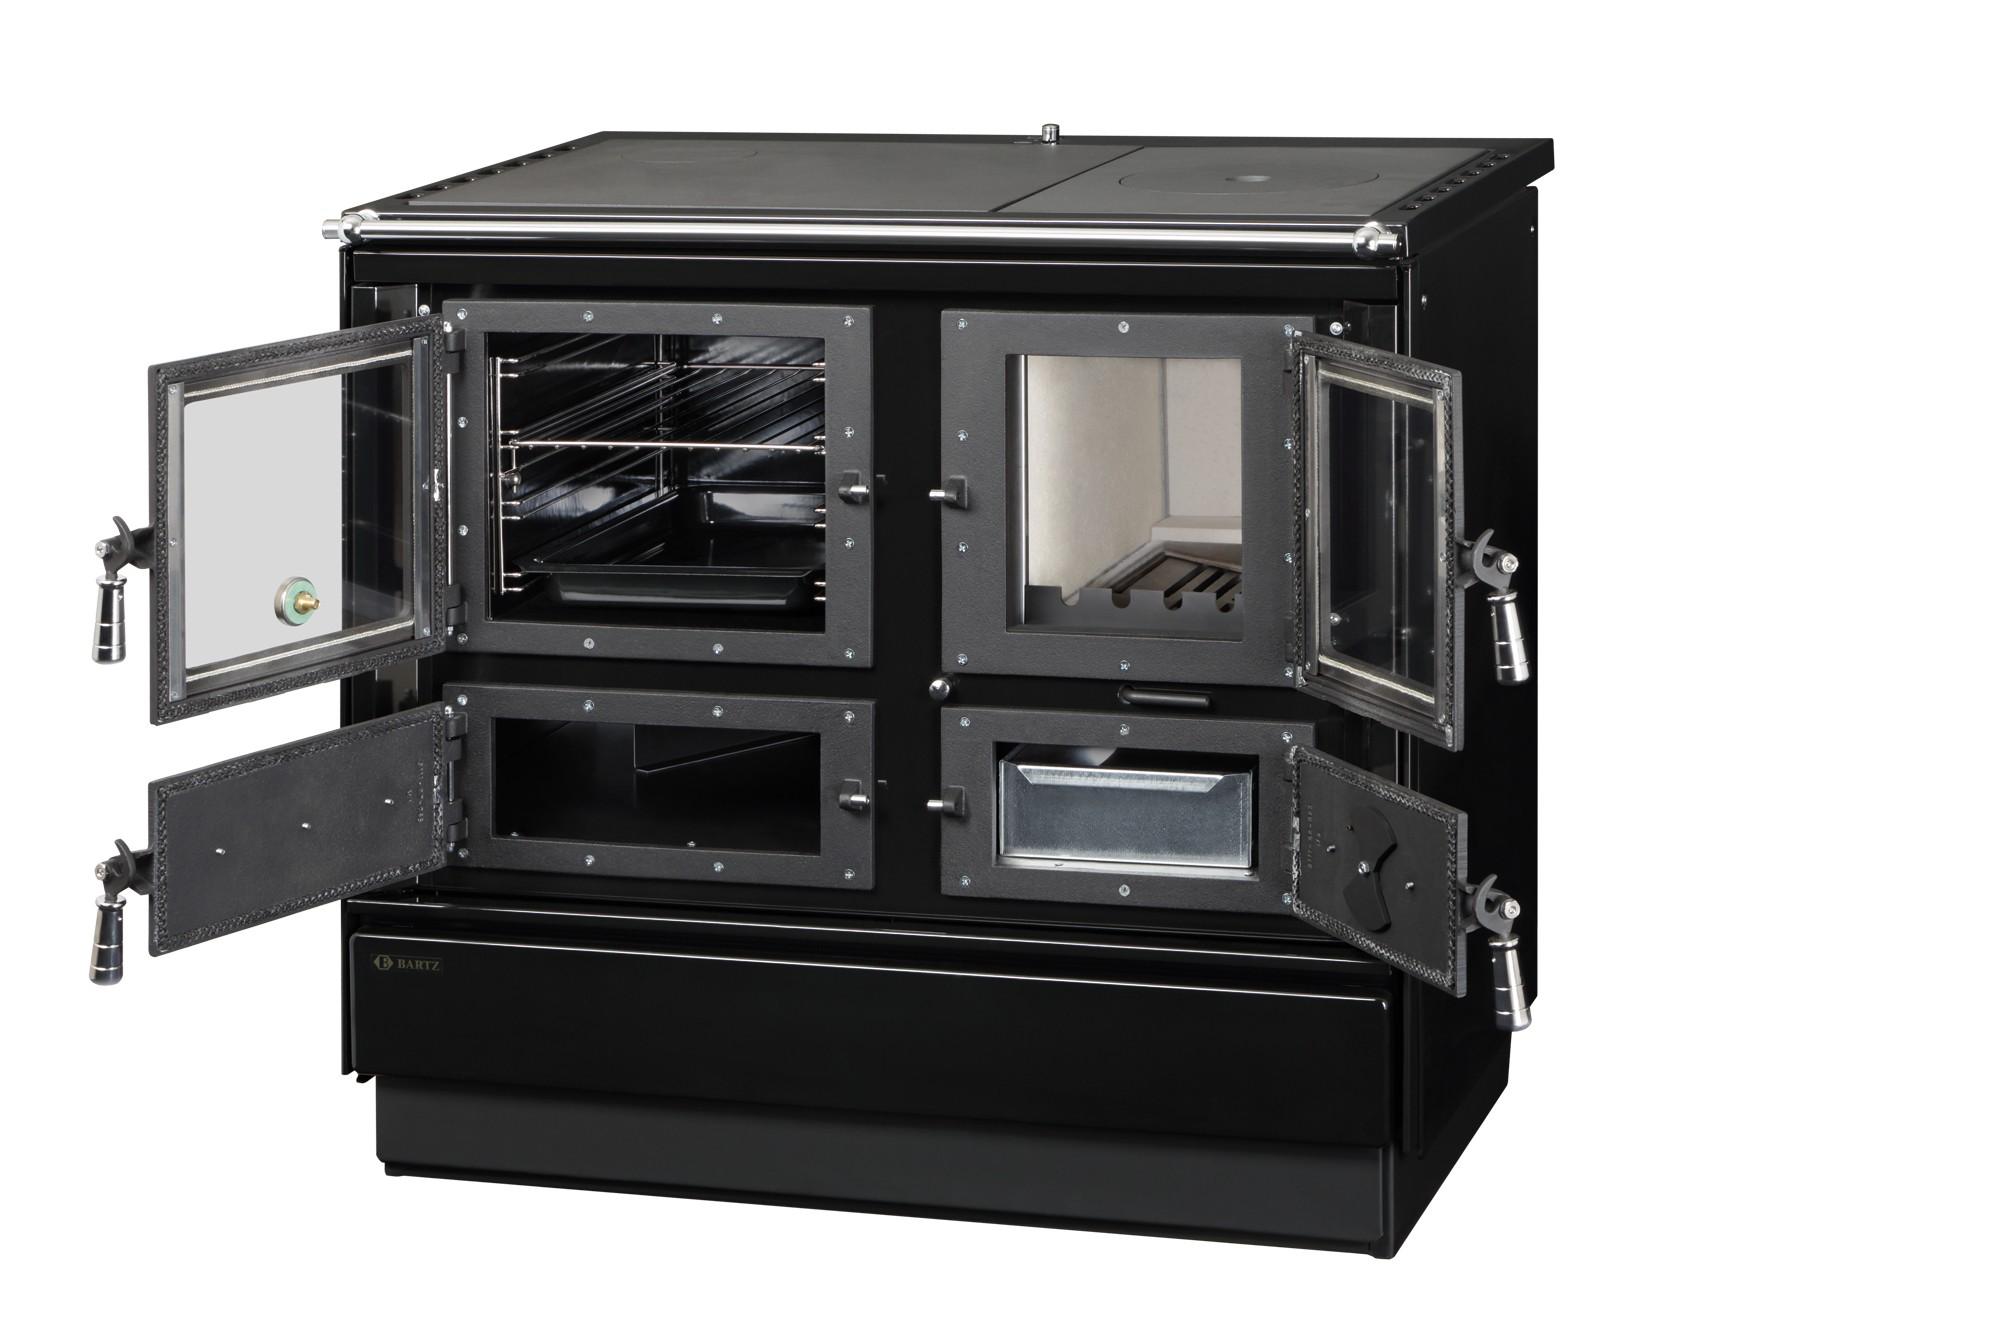 k chenherd holzherd bartz rusti schwarz anschluss links bei. Black Bedroom Furniture Sets. Home Design Ideas